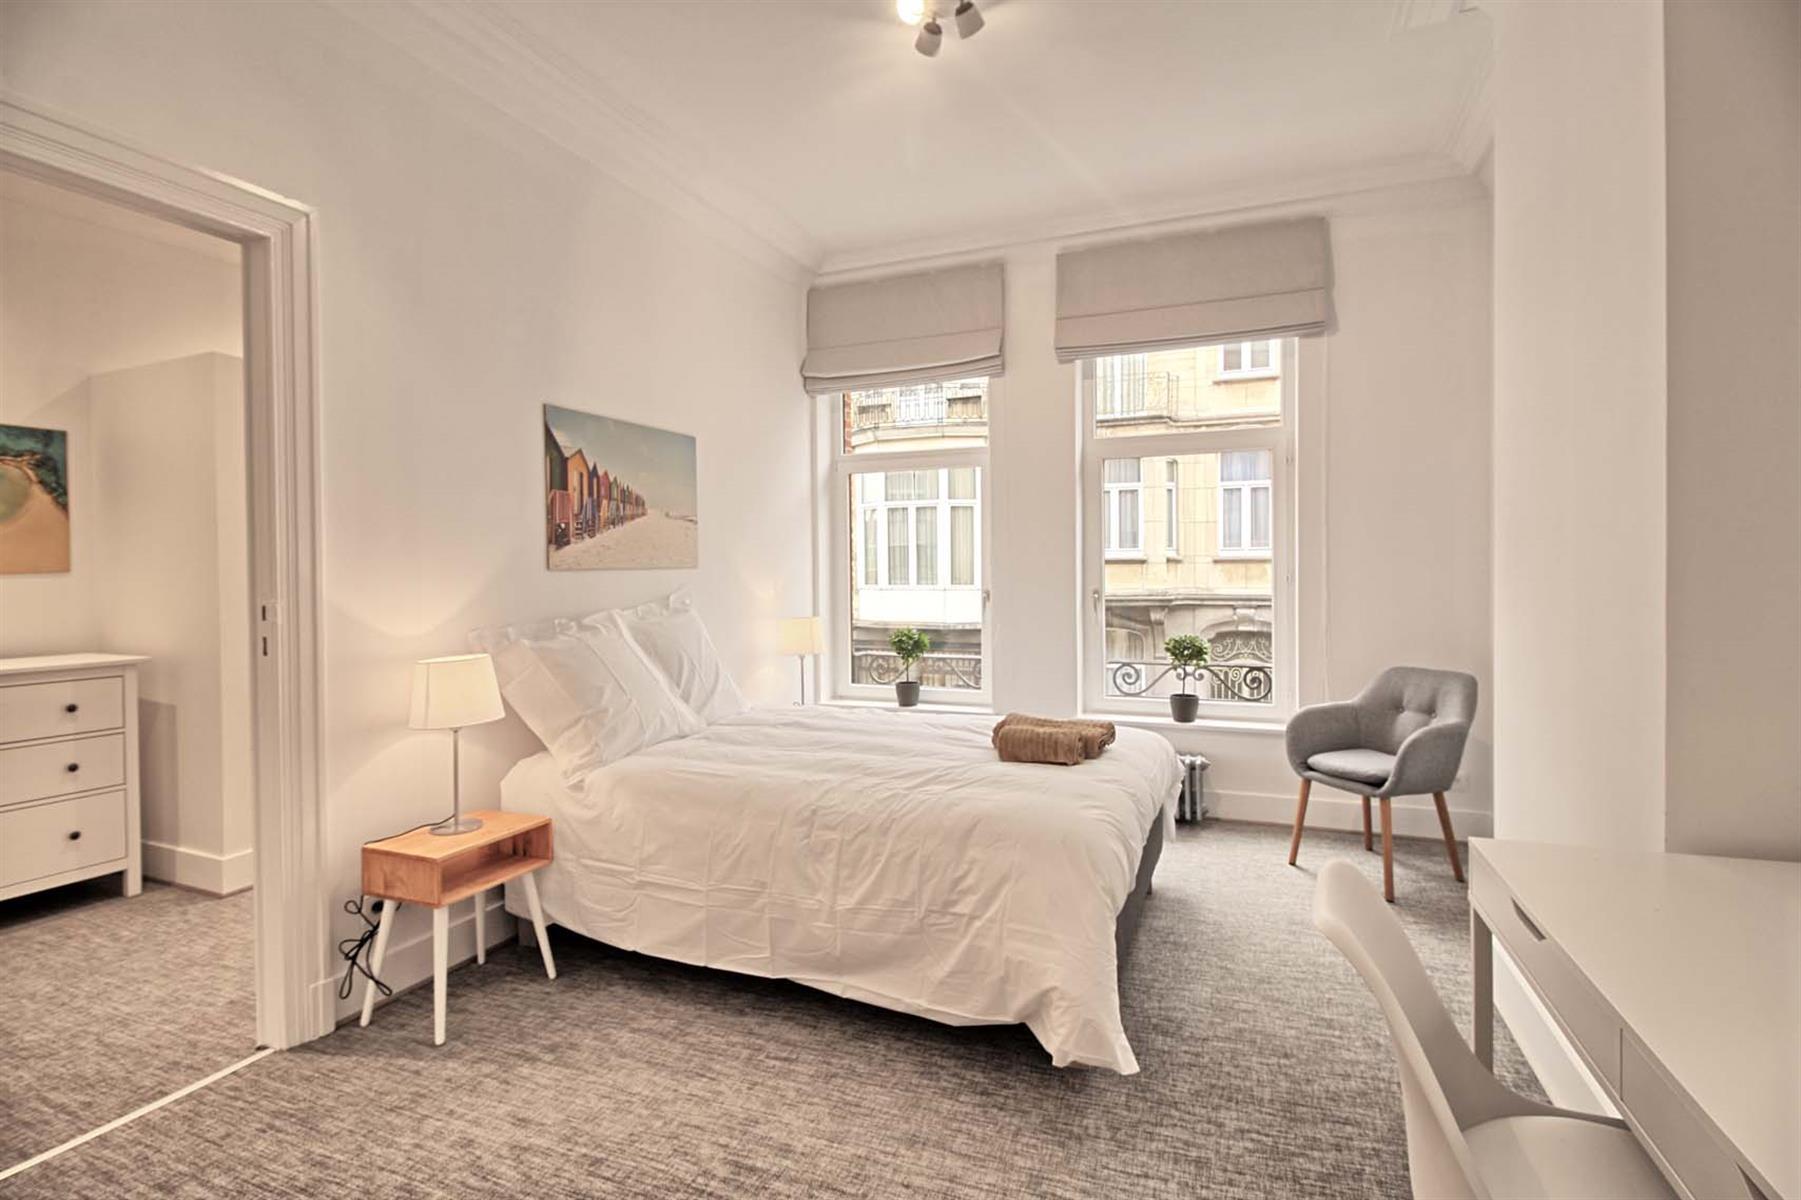 Maison - Ixelles - #4106764-10